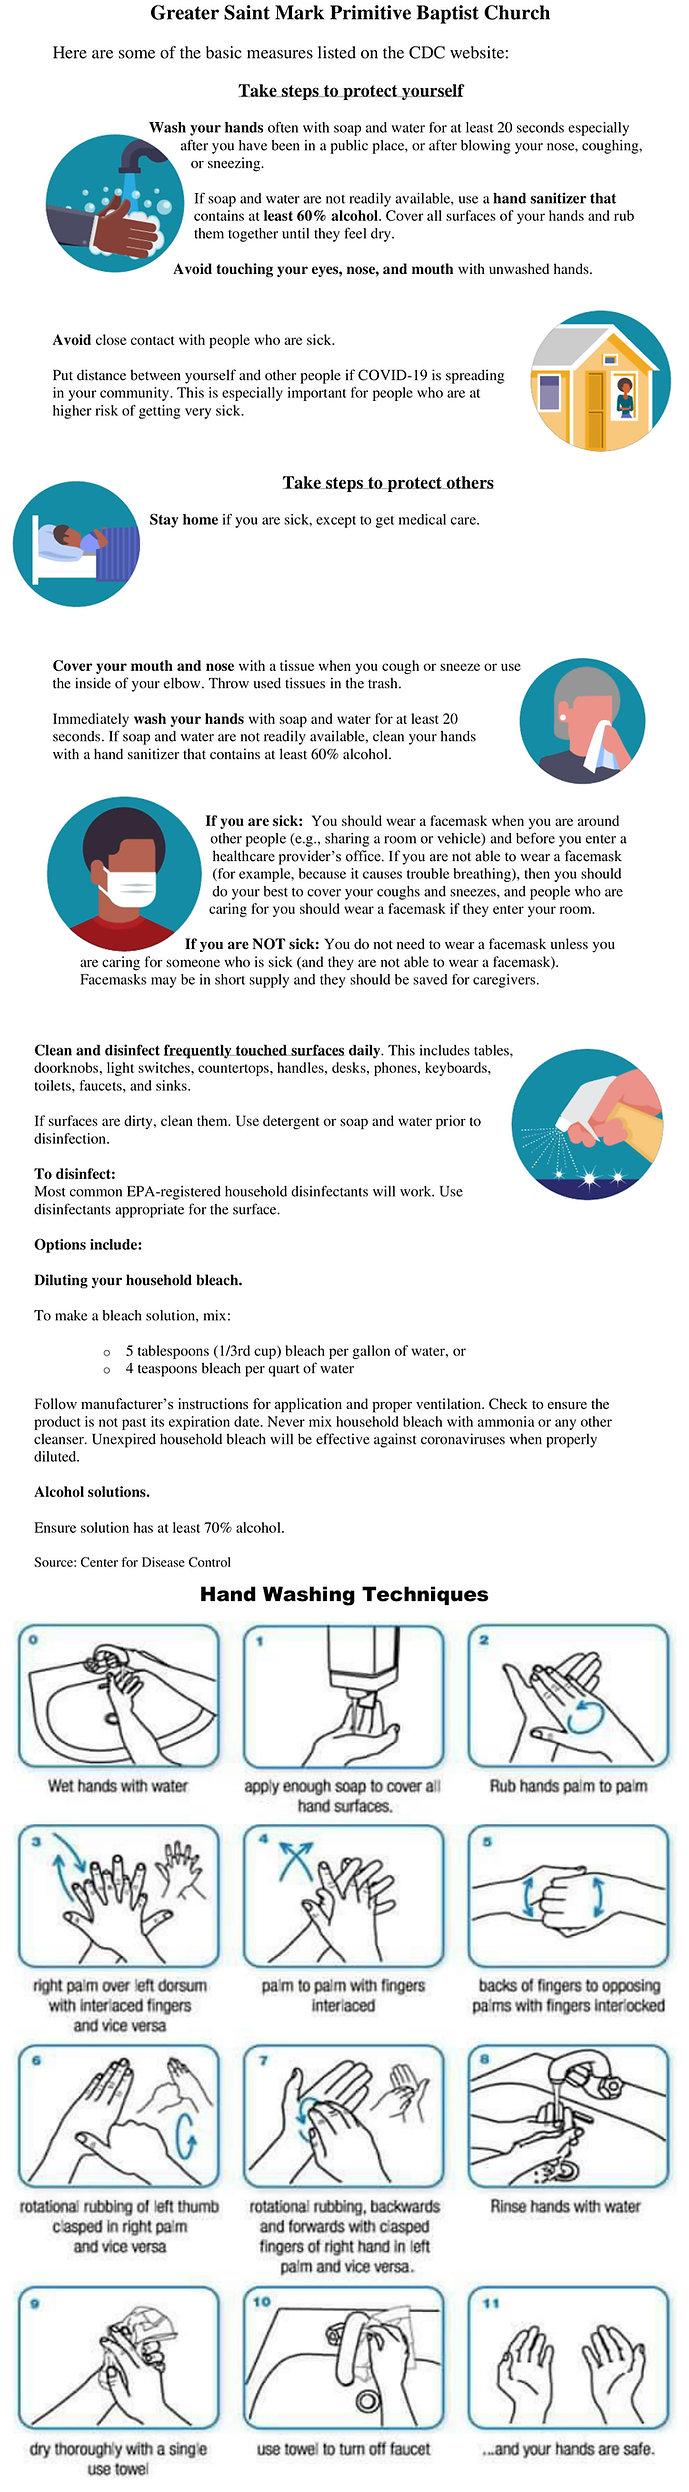 Greater St. Mark Coronavirus Tips 031720